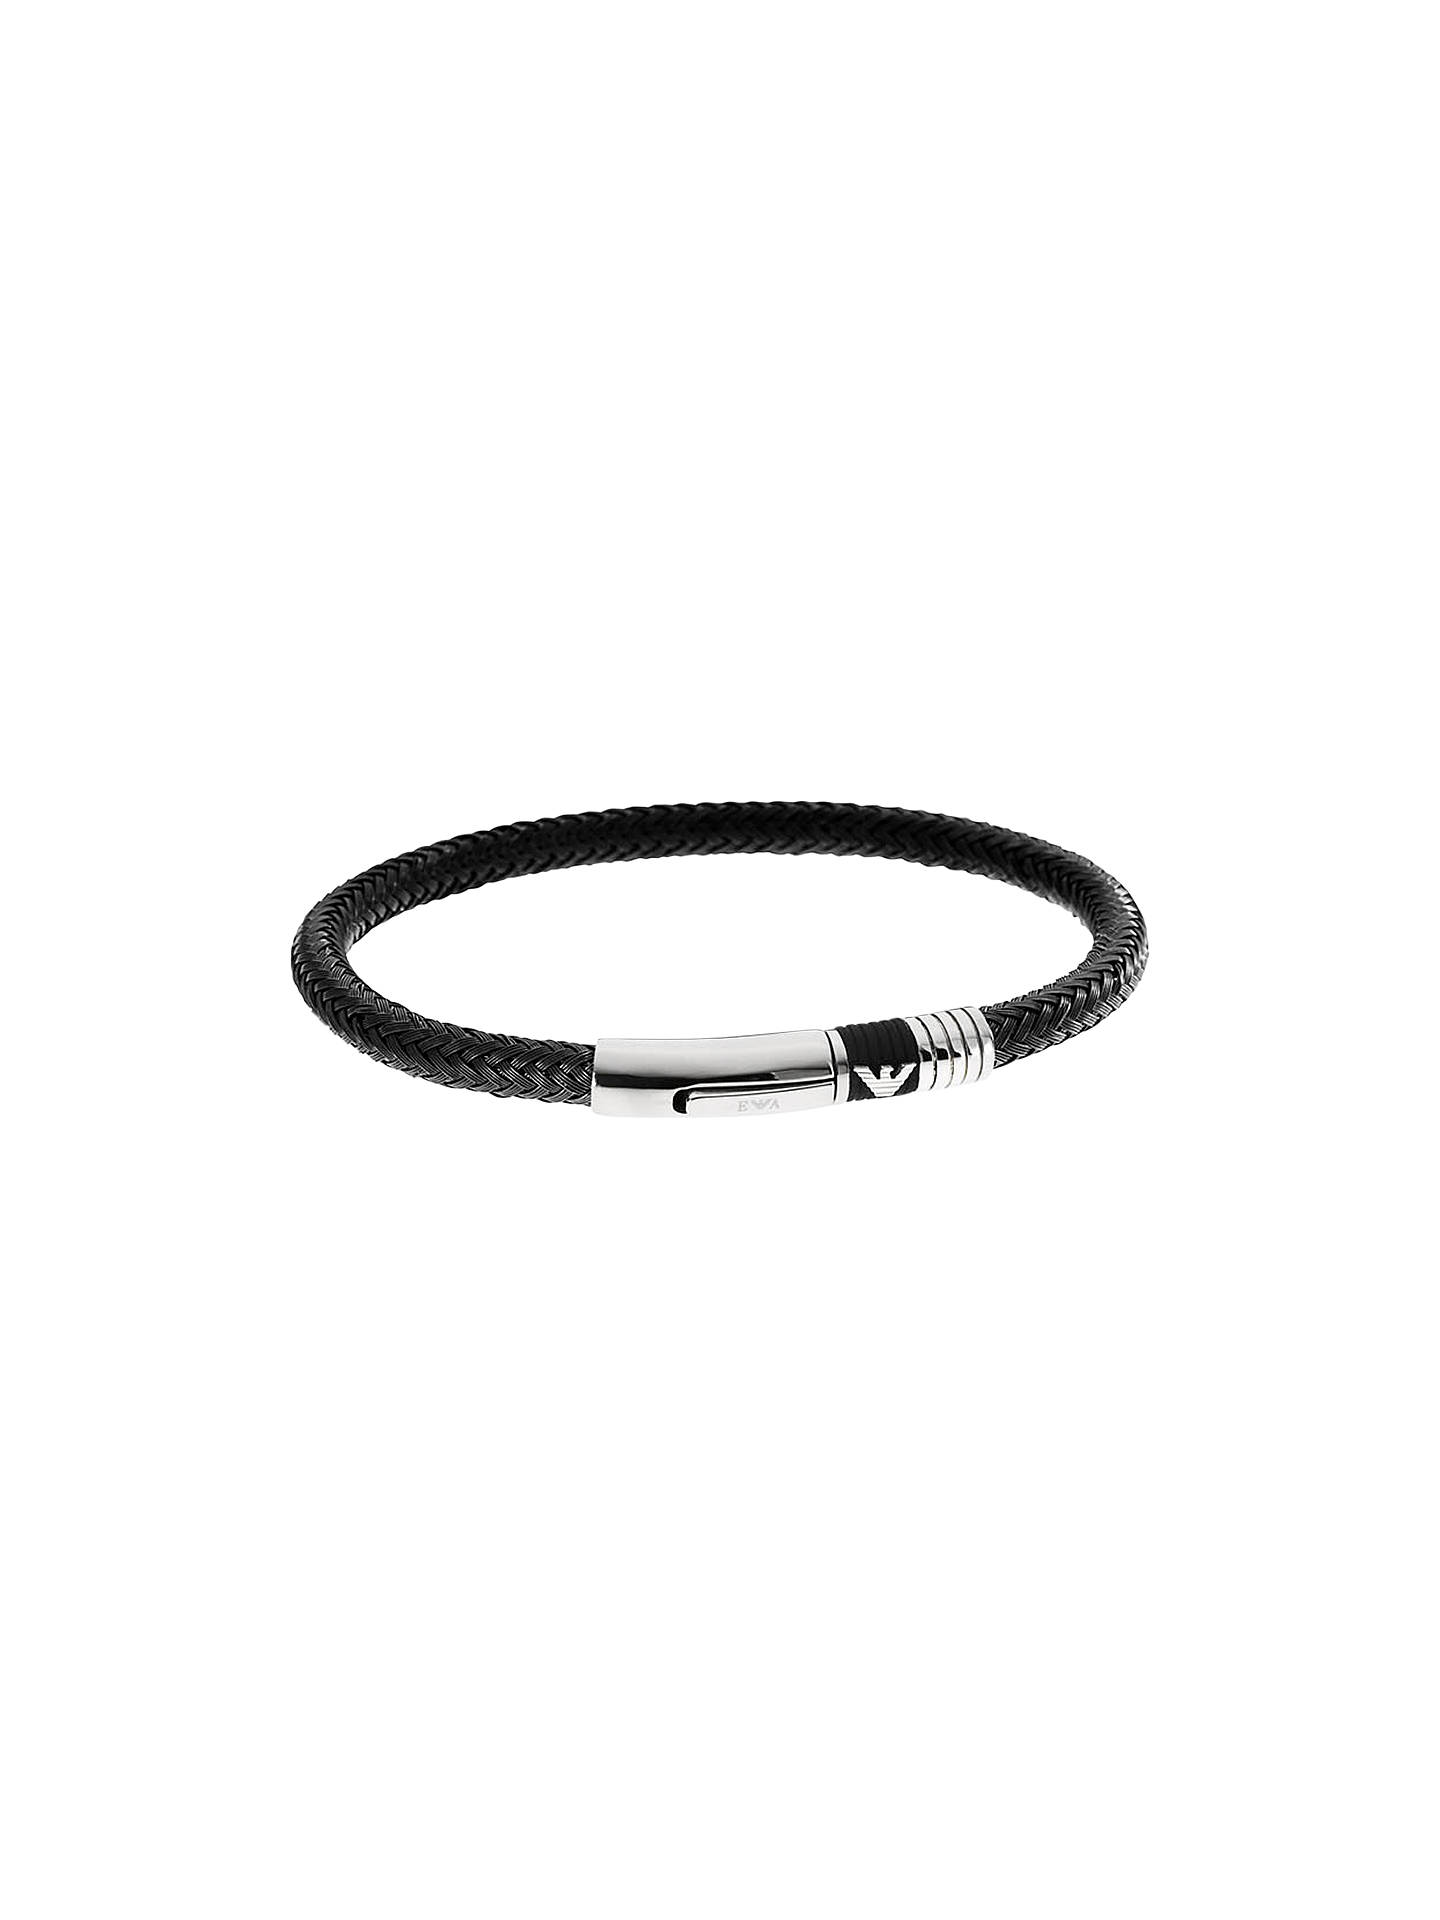 9afbae348 Buy Emporio Armani Men's Braided Leather Bracelet, Black/Silver Online at  johnlewis.com